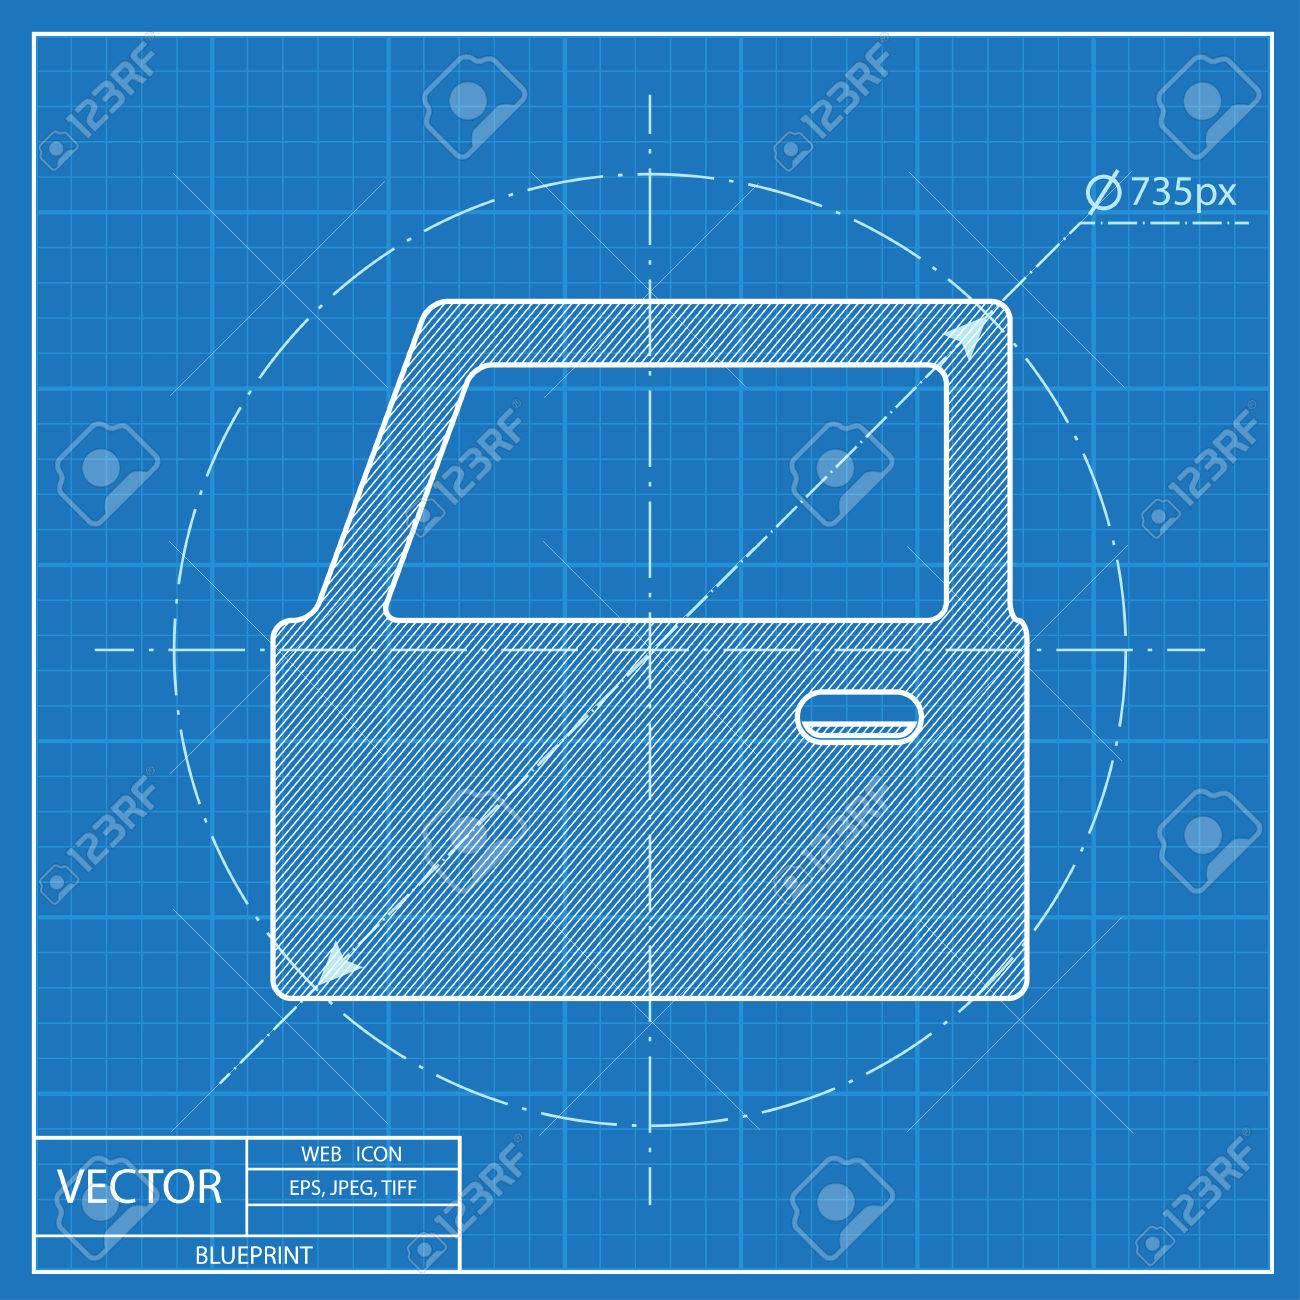 Blueprint icon of car door royalty free cliparts vectors and stock blueprint icon of car door stock vector 55724508 malvernweather Choice Image